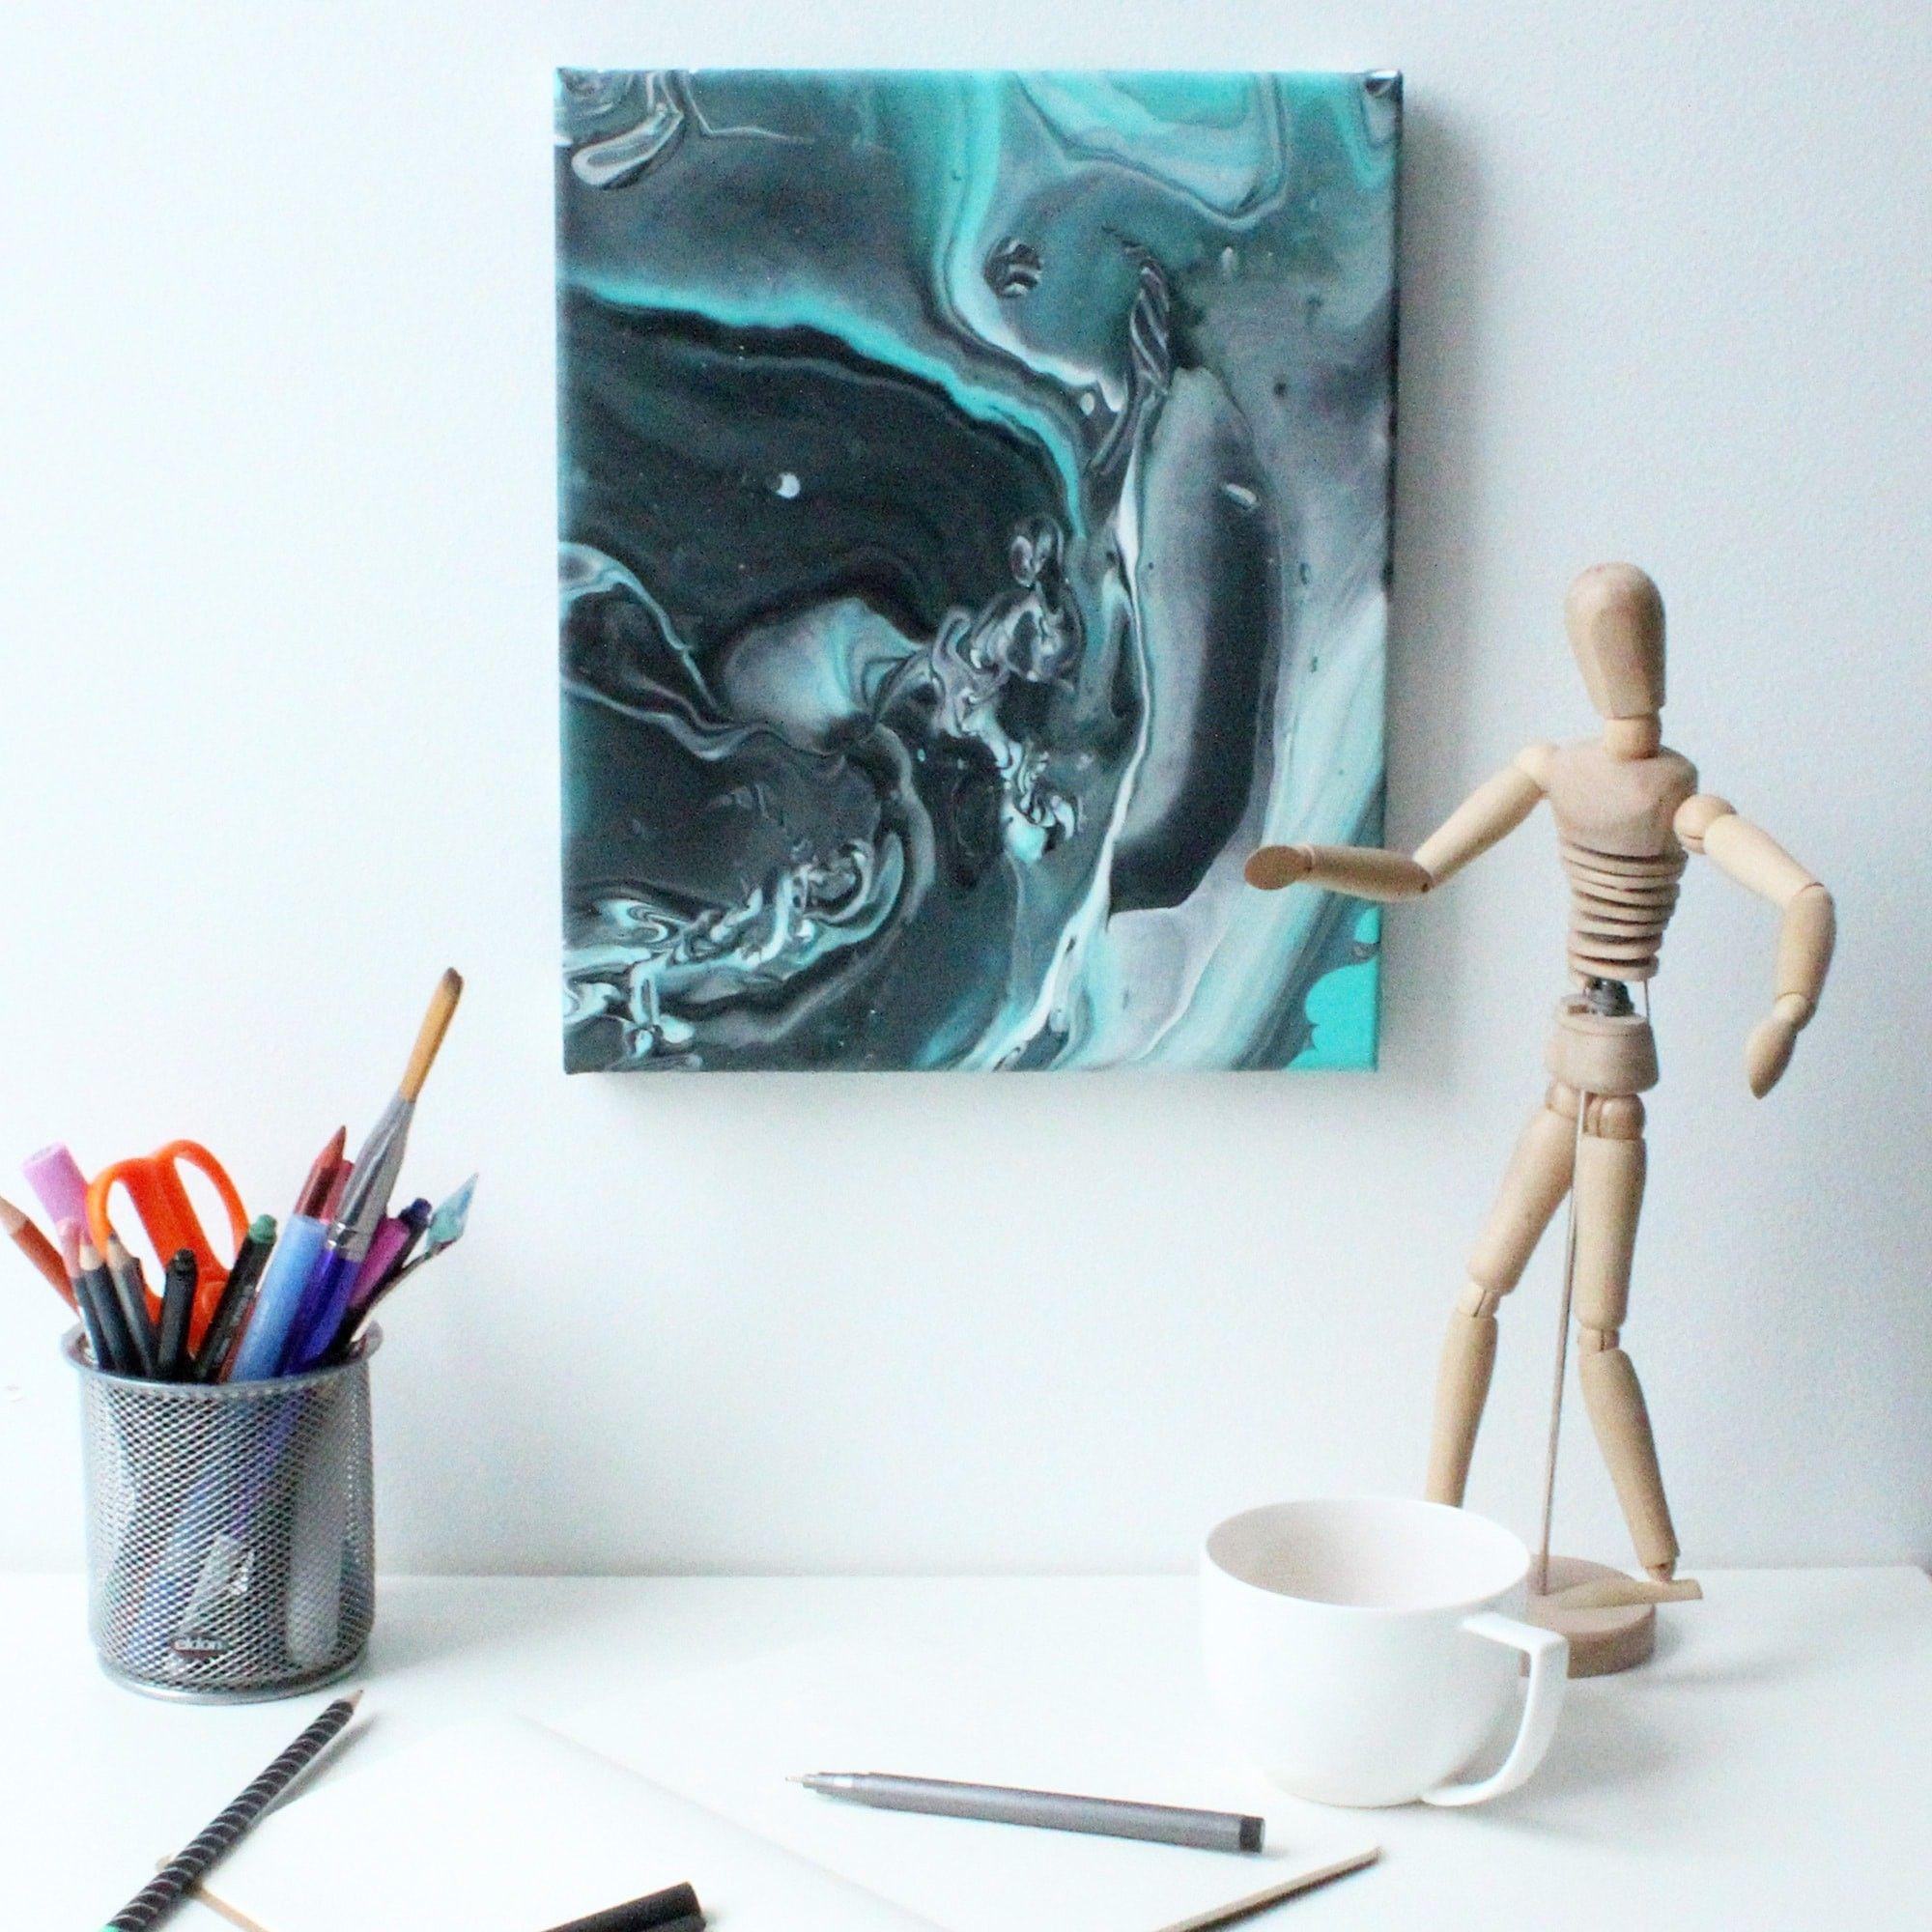 Peinture Abstraite Coulage Sur Toile Abstract Pinterest